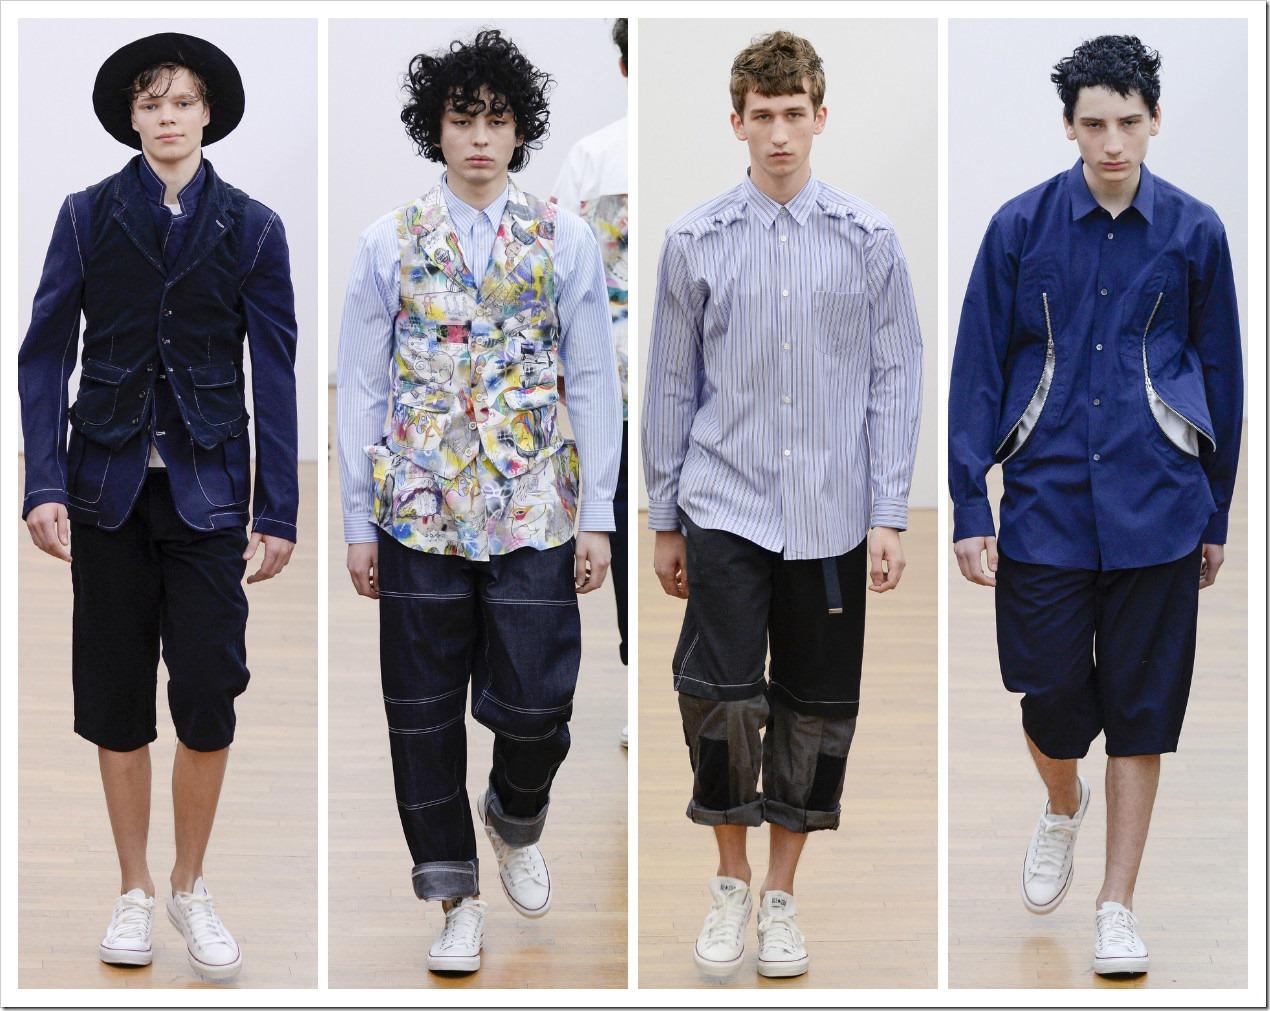 ComaComme des Garçons Shirt Menswear Collection at Fall 2016